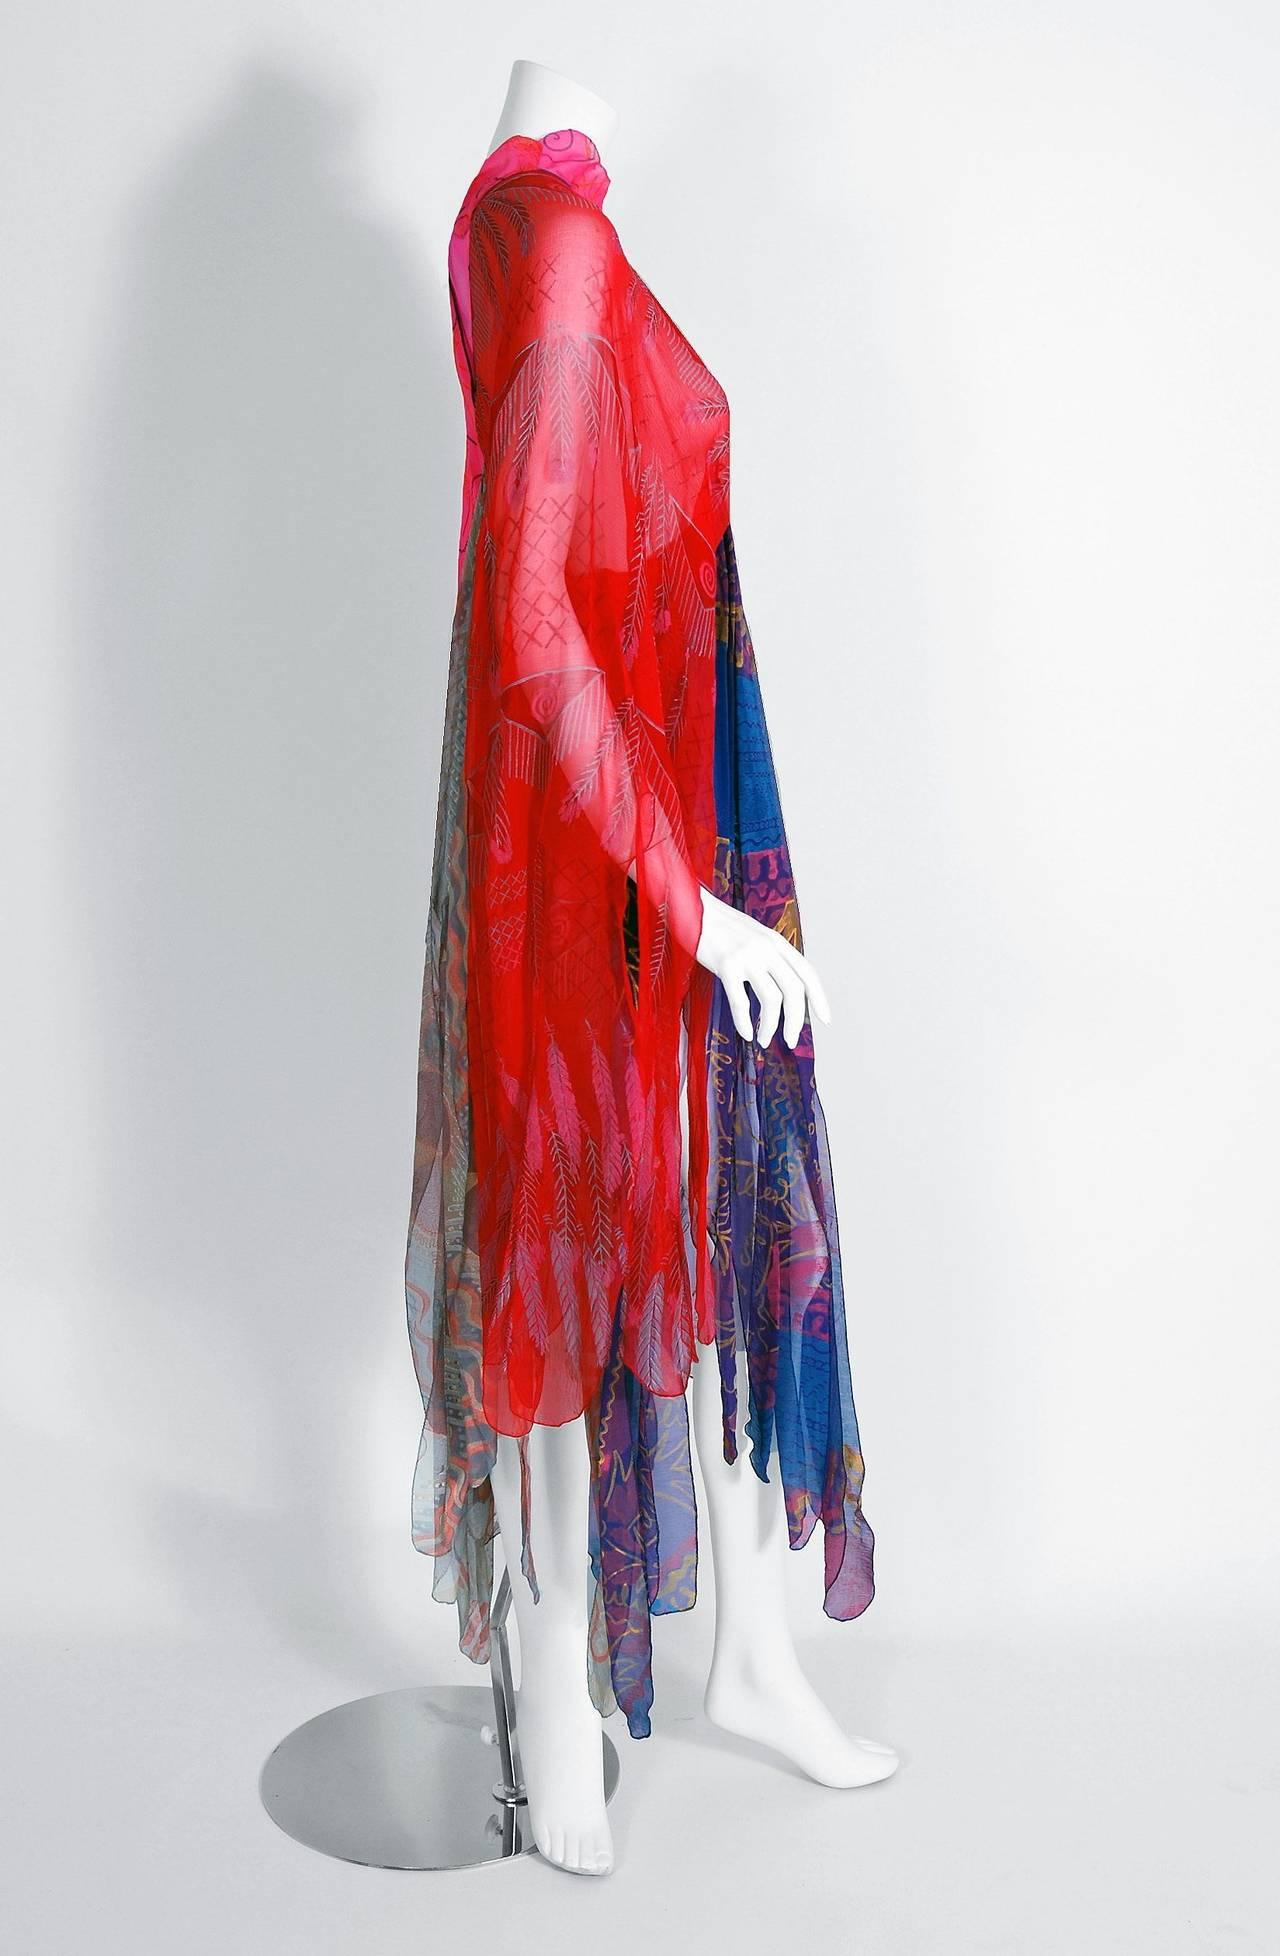 1972 Zandra Rhodes Hand-Painted Indian Feathers & Lillies Silk Caftan Dress 3